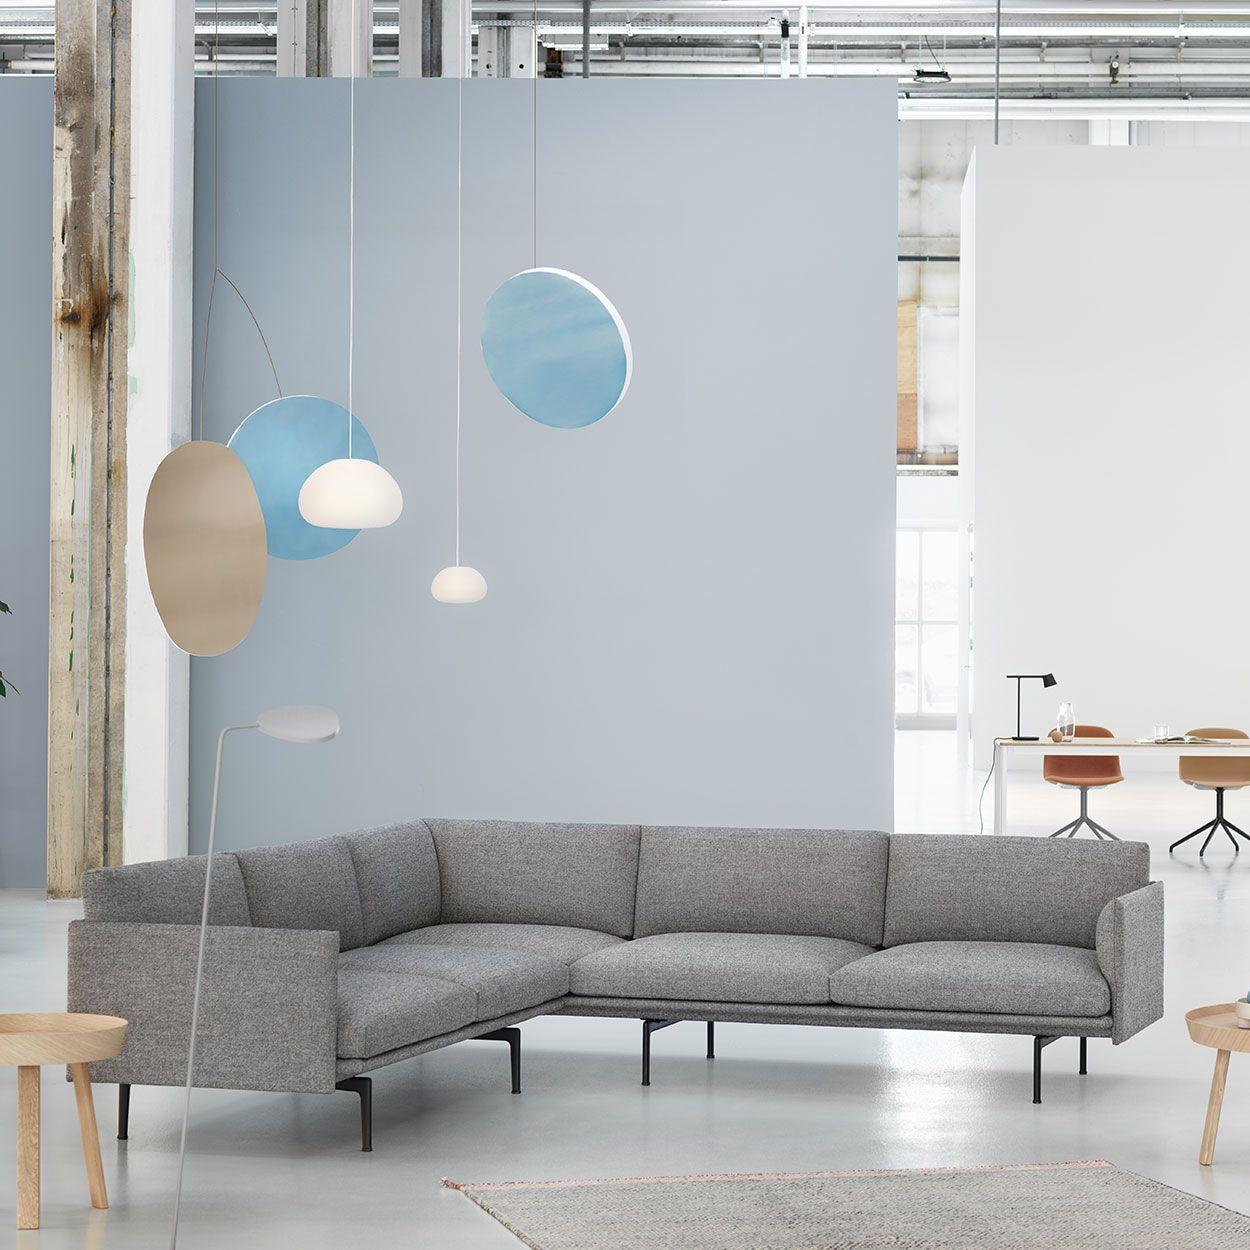 Minimal Corner Sofa Home Decor Inspiration From Muuto Embodying Refined And Elegant Des Scandinavian Sofa Design Corner Sofa Design Scandinavian Corner Sofa